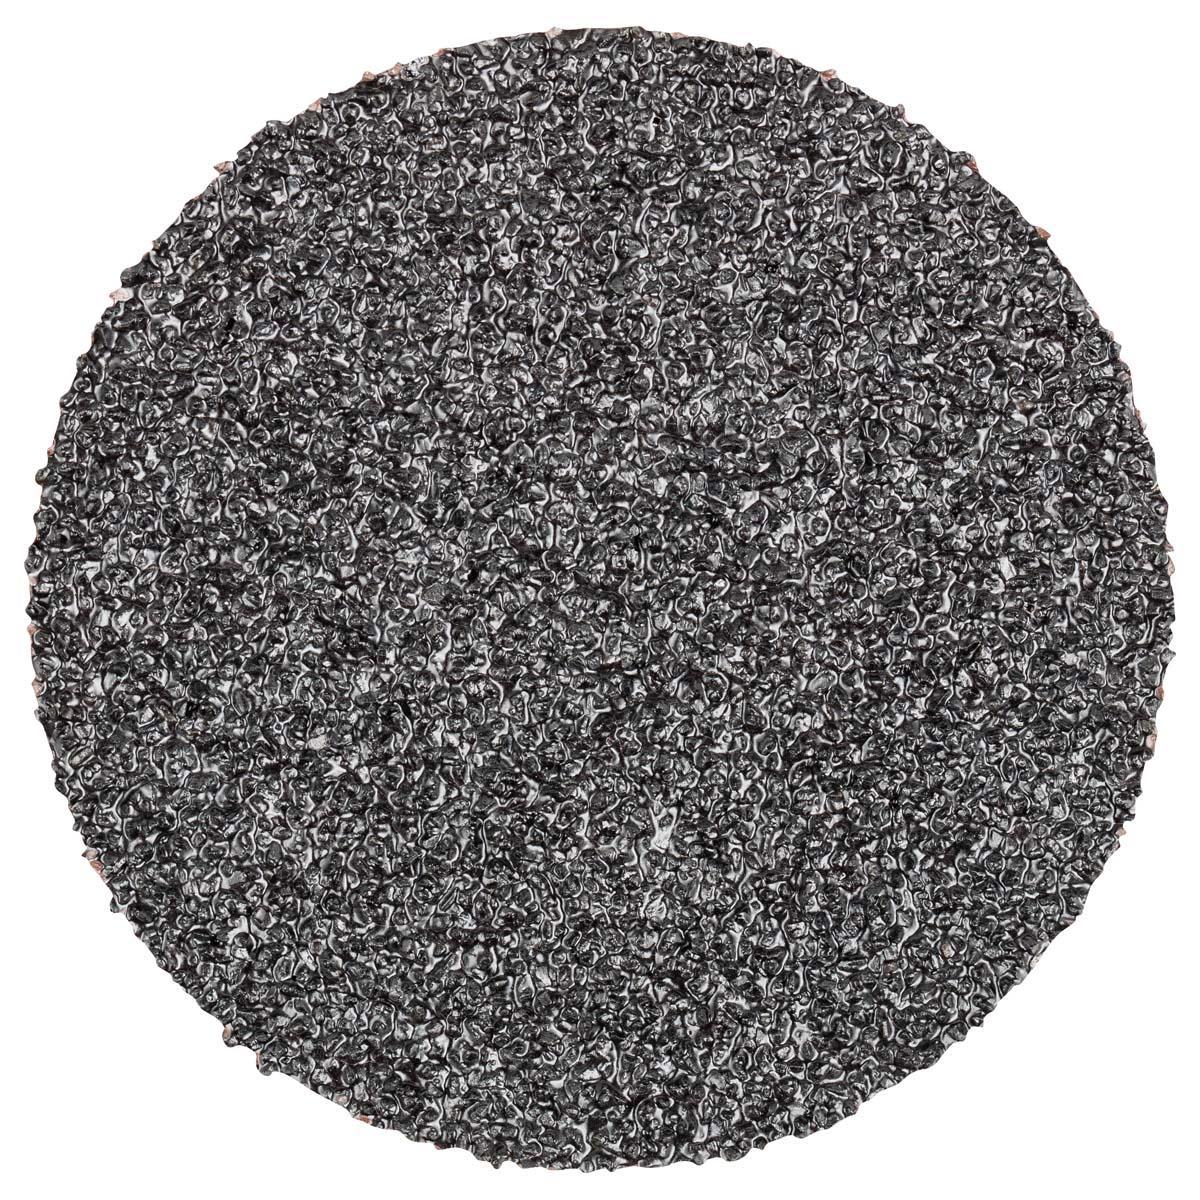 "2"" COMBIDISC Abrasive Disc Type CDR - Silicon Carbide - 36 Grit"